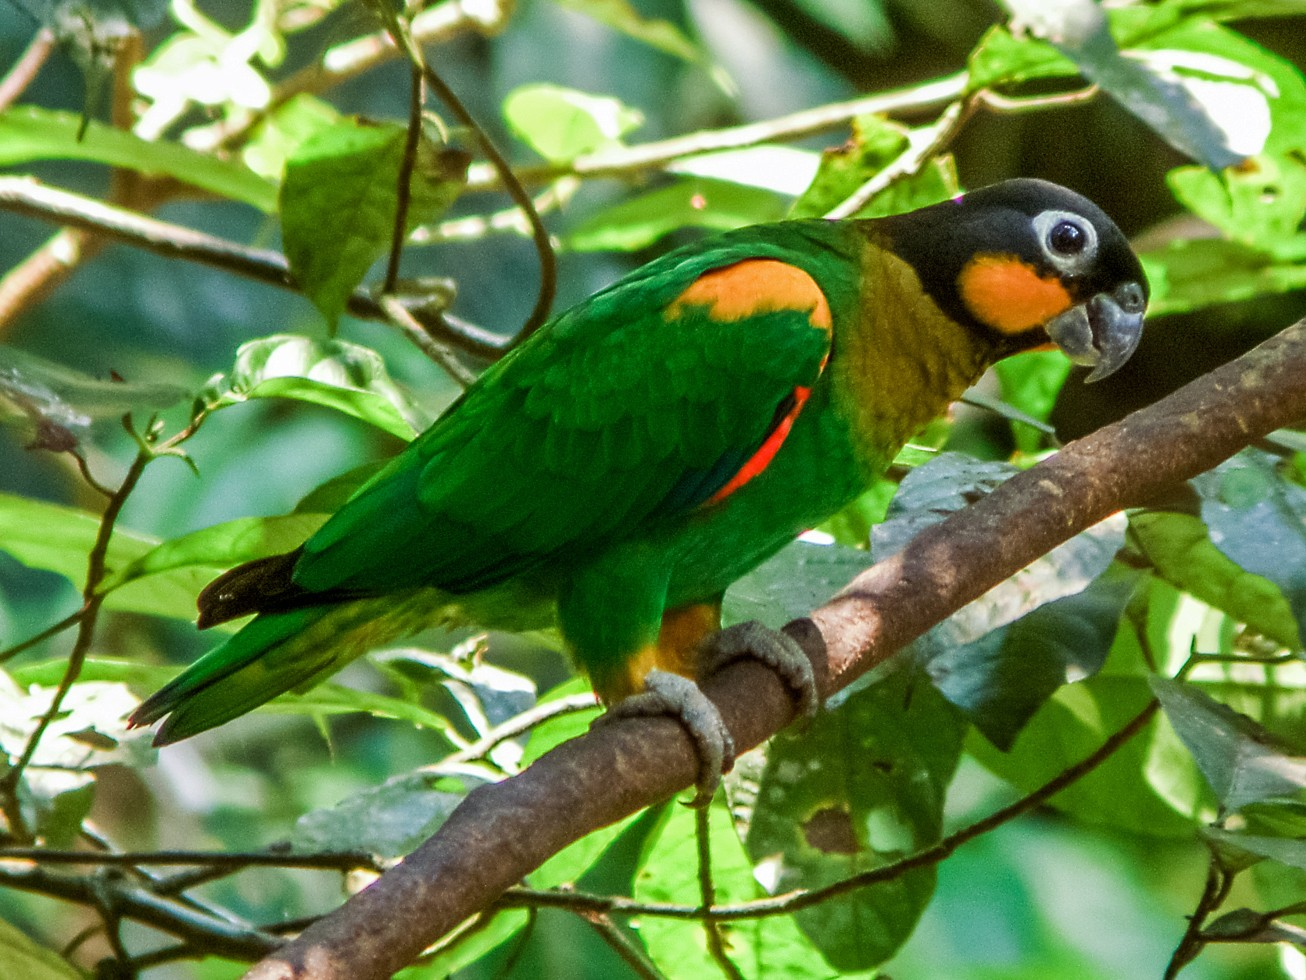 Orange-cheeked Parrot - Nick Athanas